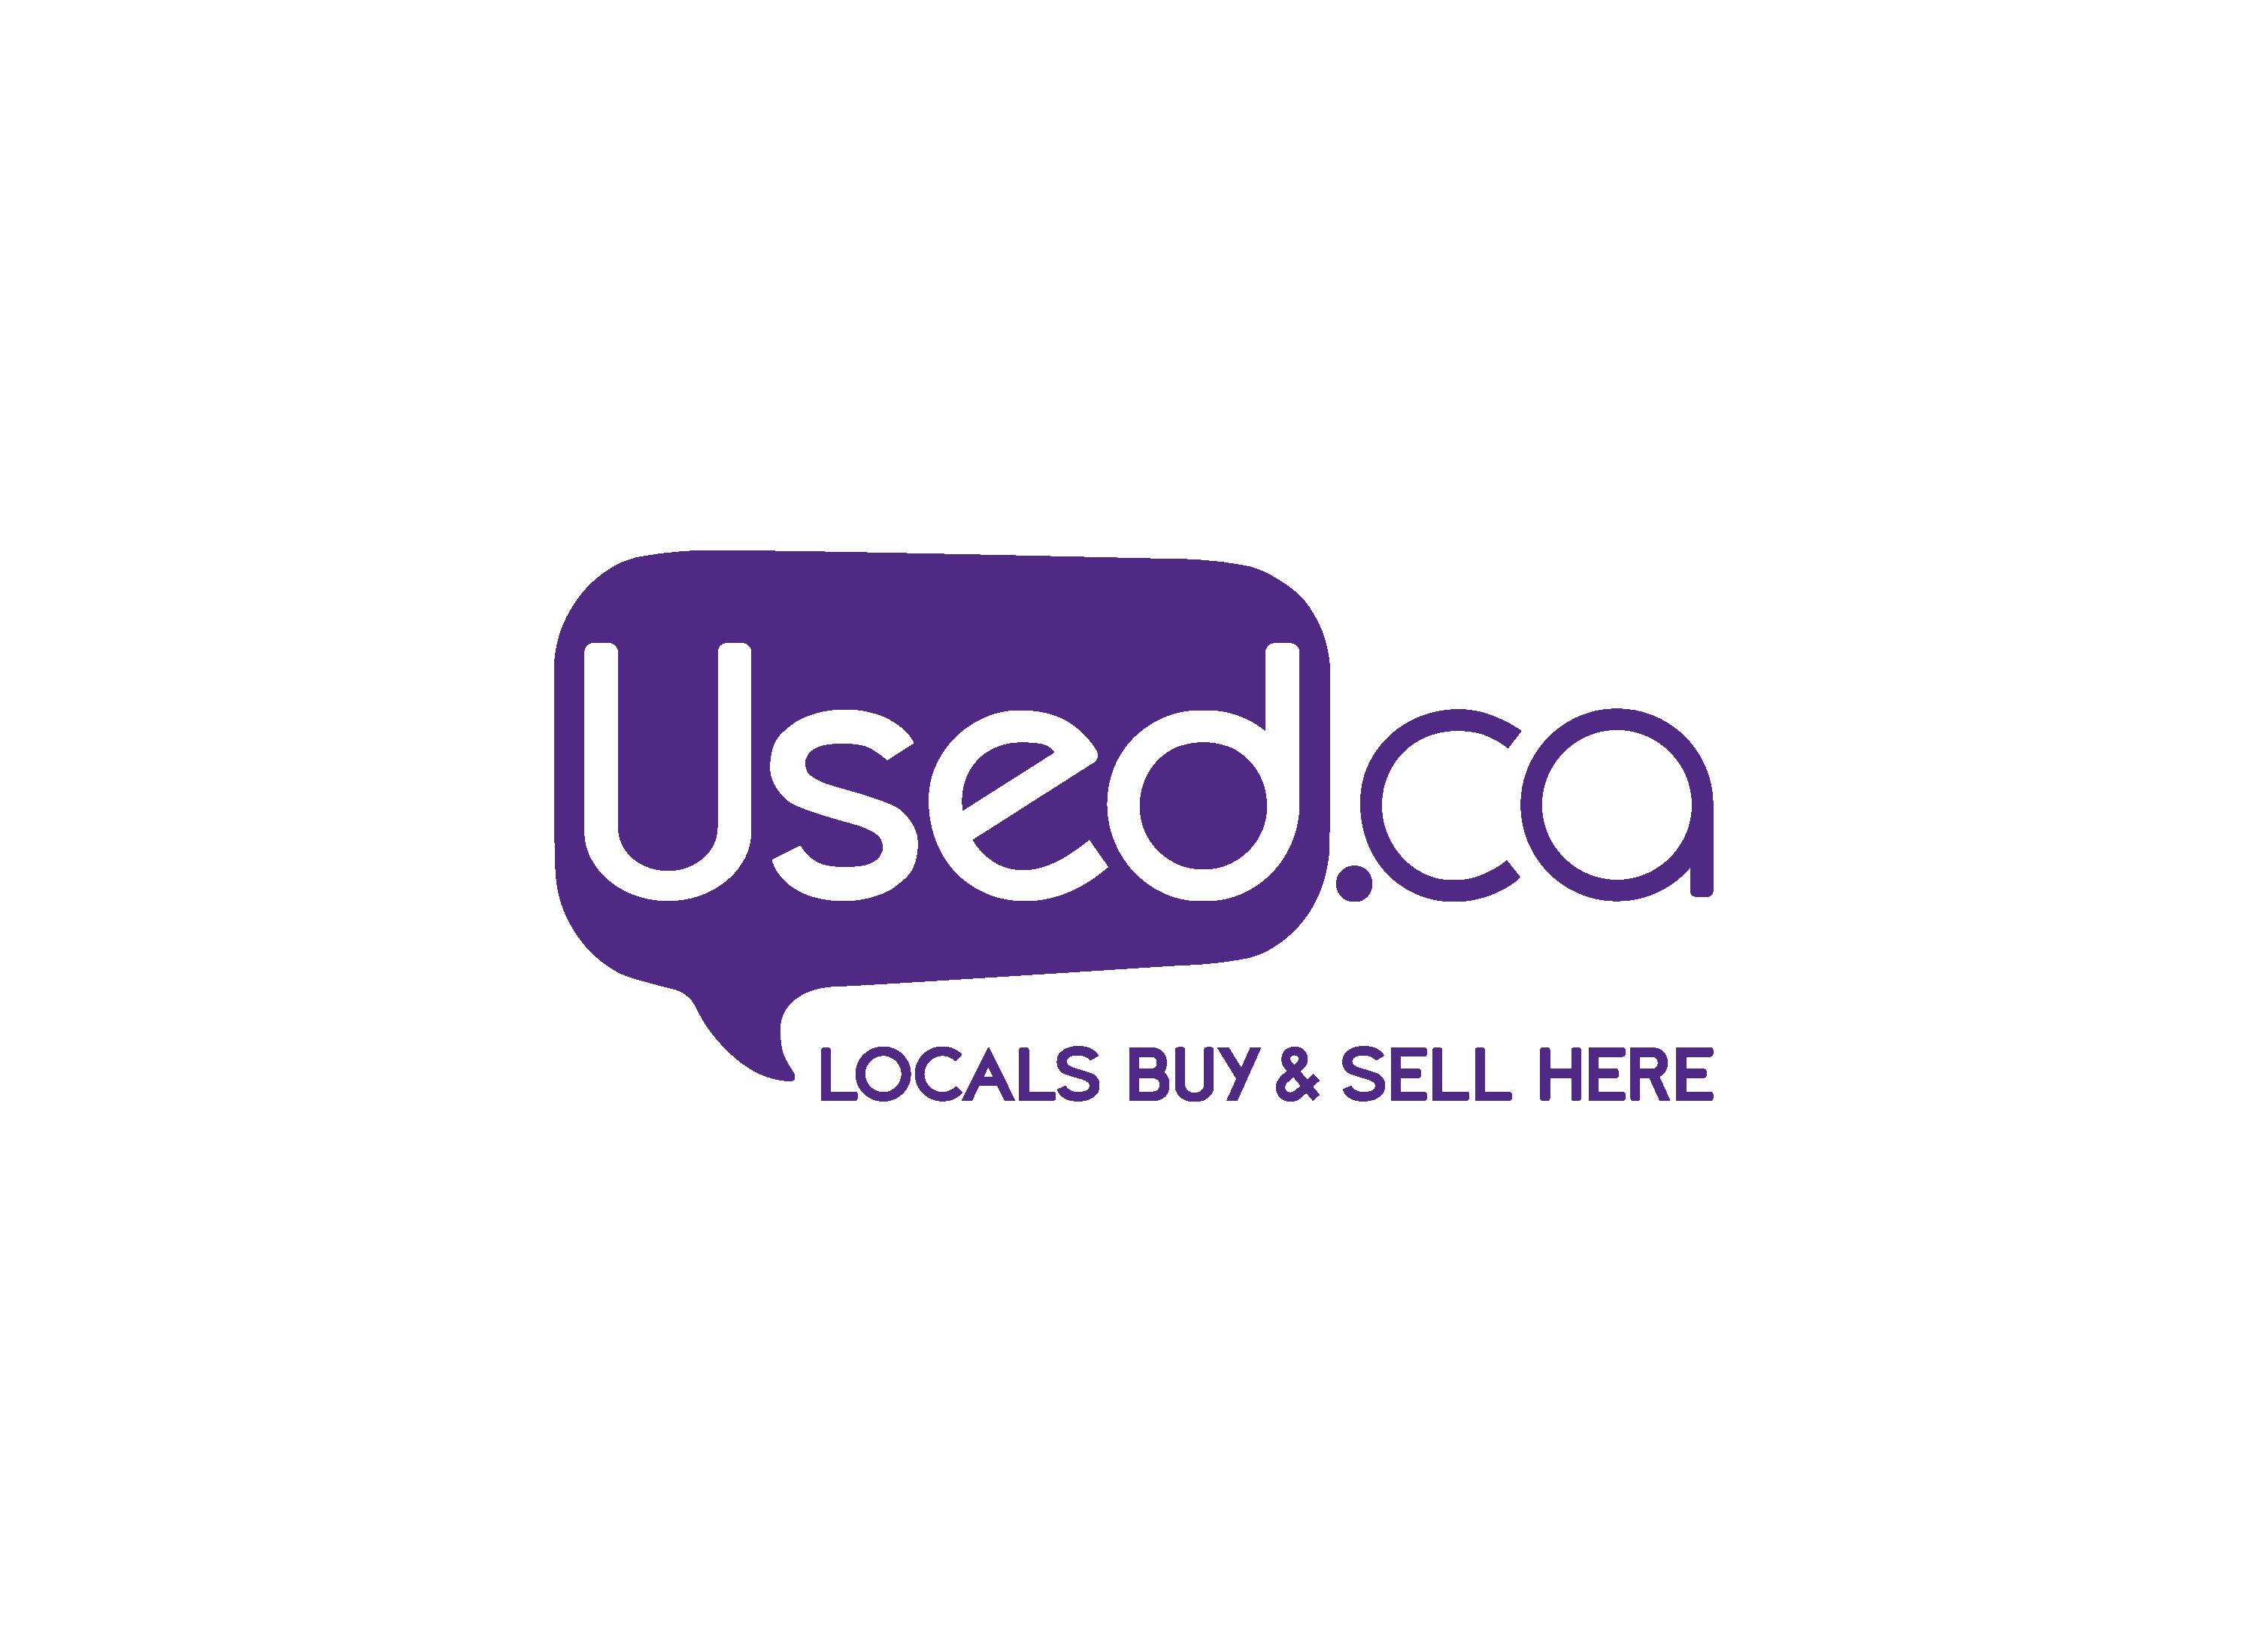 Used.ca - Media Sponsor / Entry table